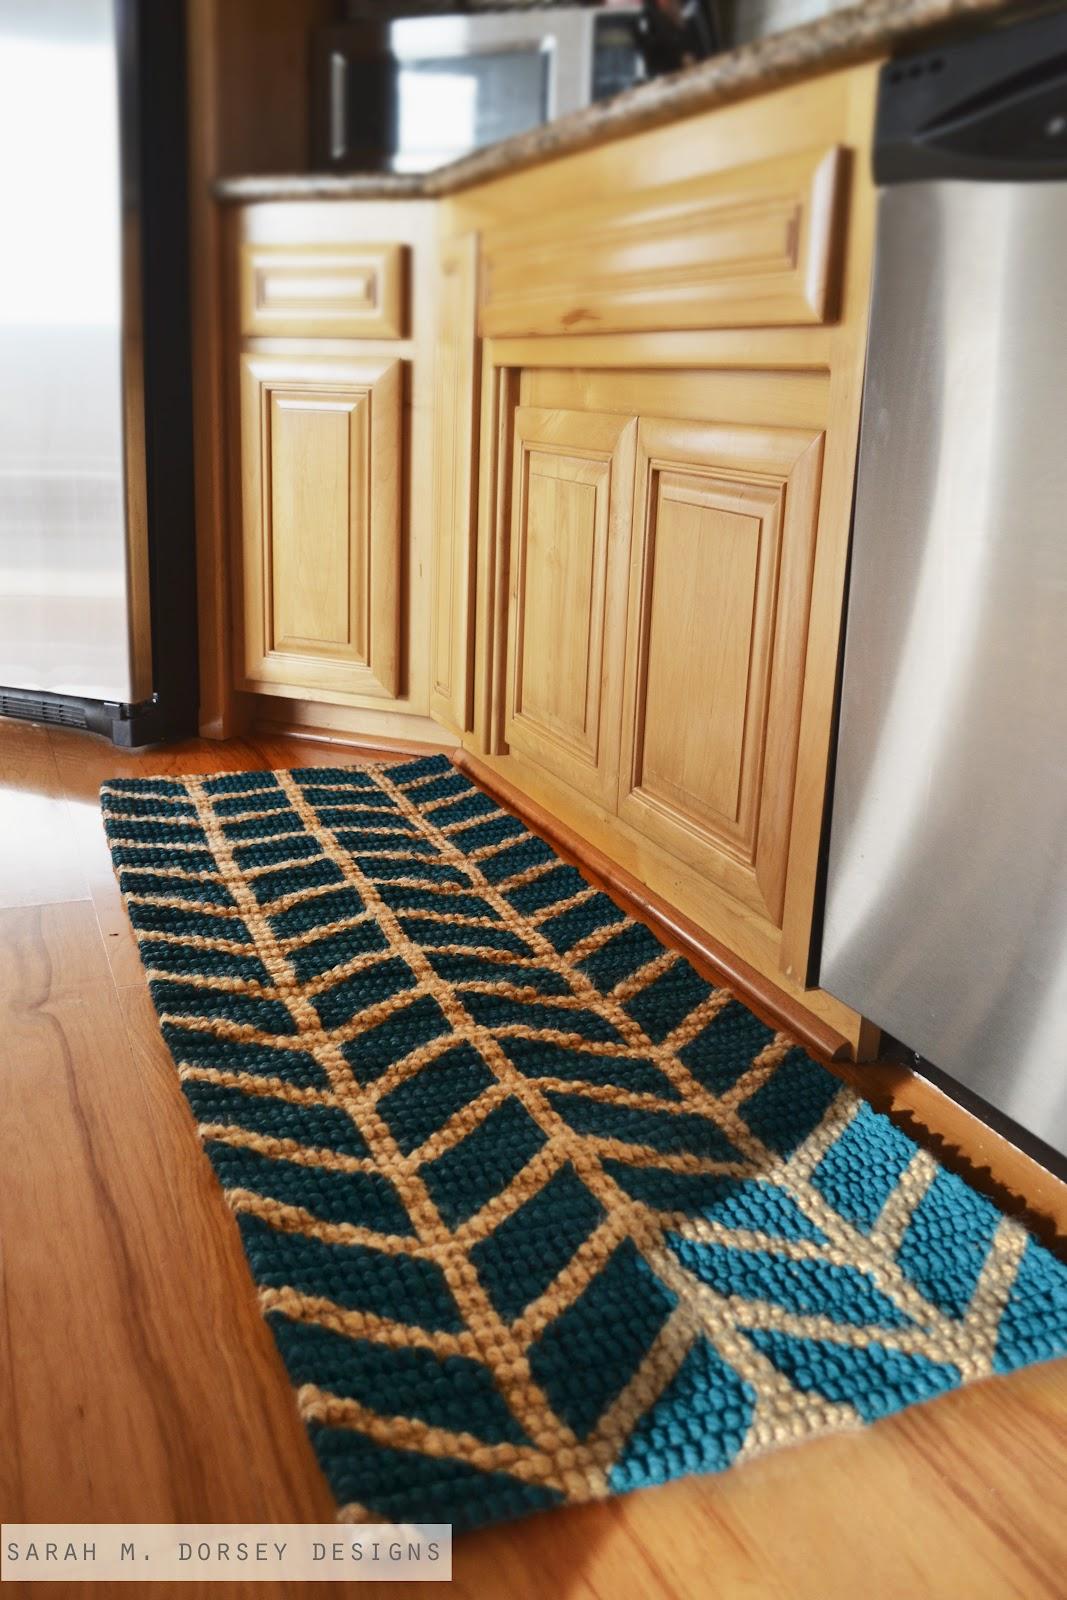 product by isa chevron com rugs jordhome jord original is rug notonthehighstreet home